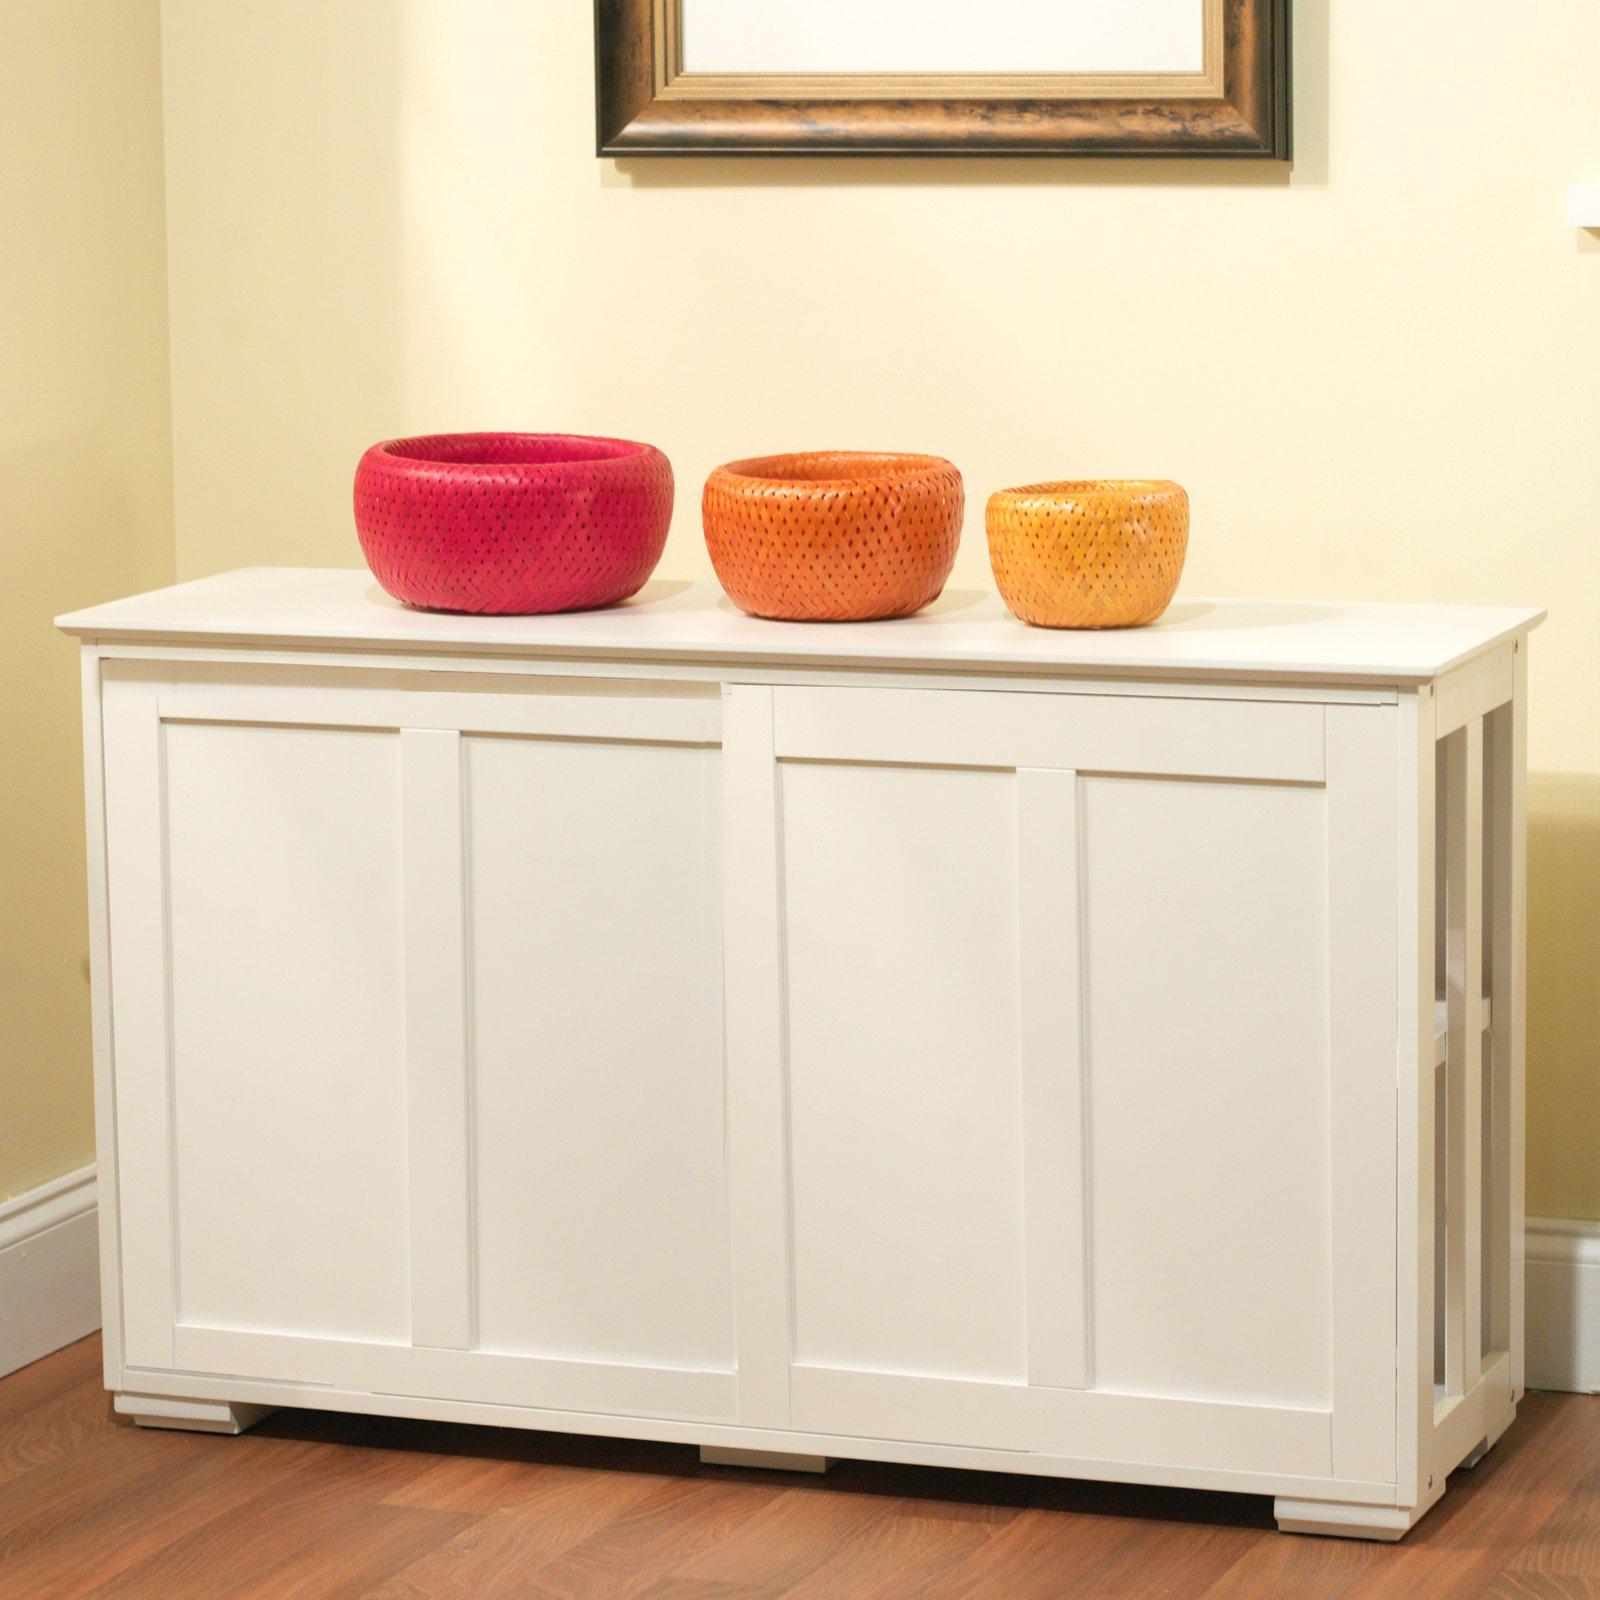 Sliding Wood Doors Stackable Storage Cabinet, Multiple Colors – Walmart Pertaining To Espresso Sliding Door Stackable Buffets (View 18 of 20)